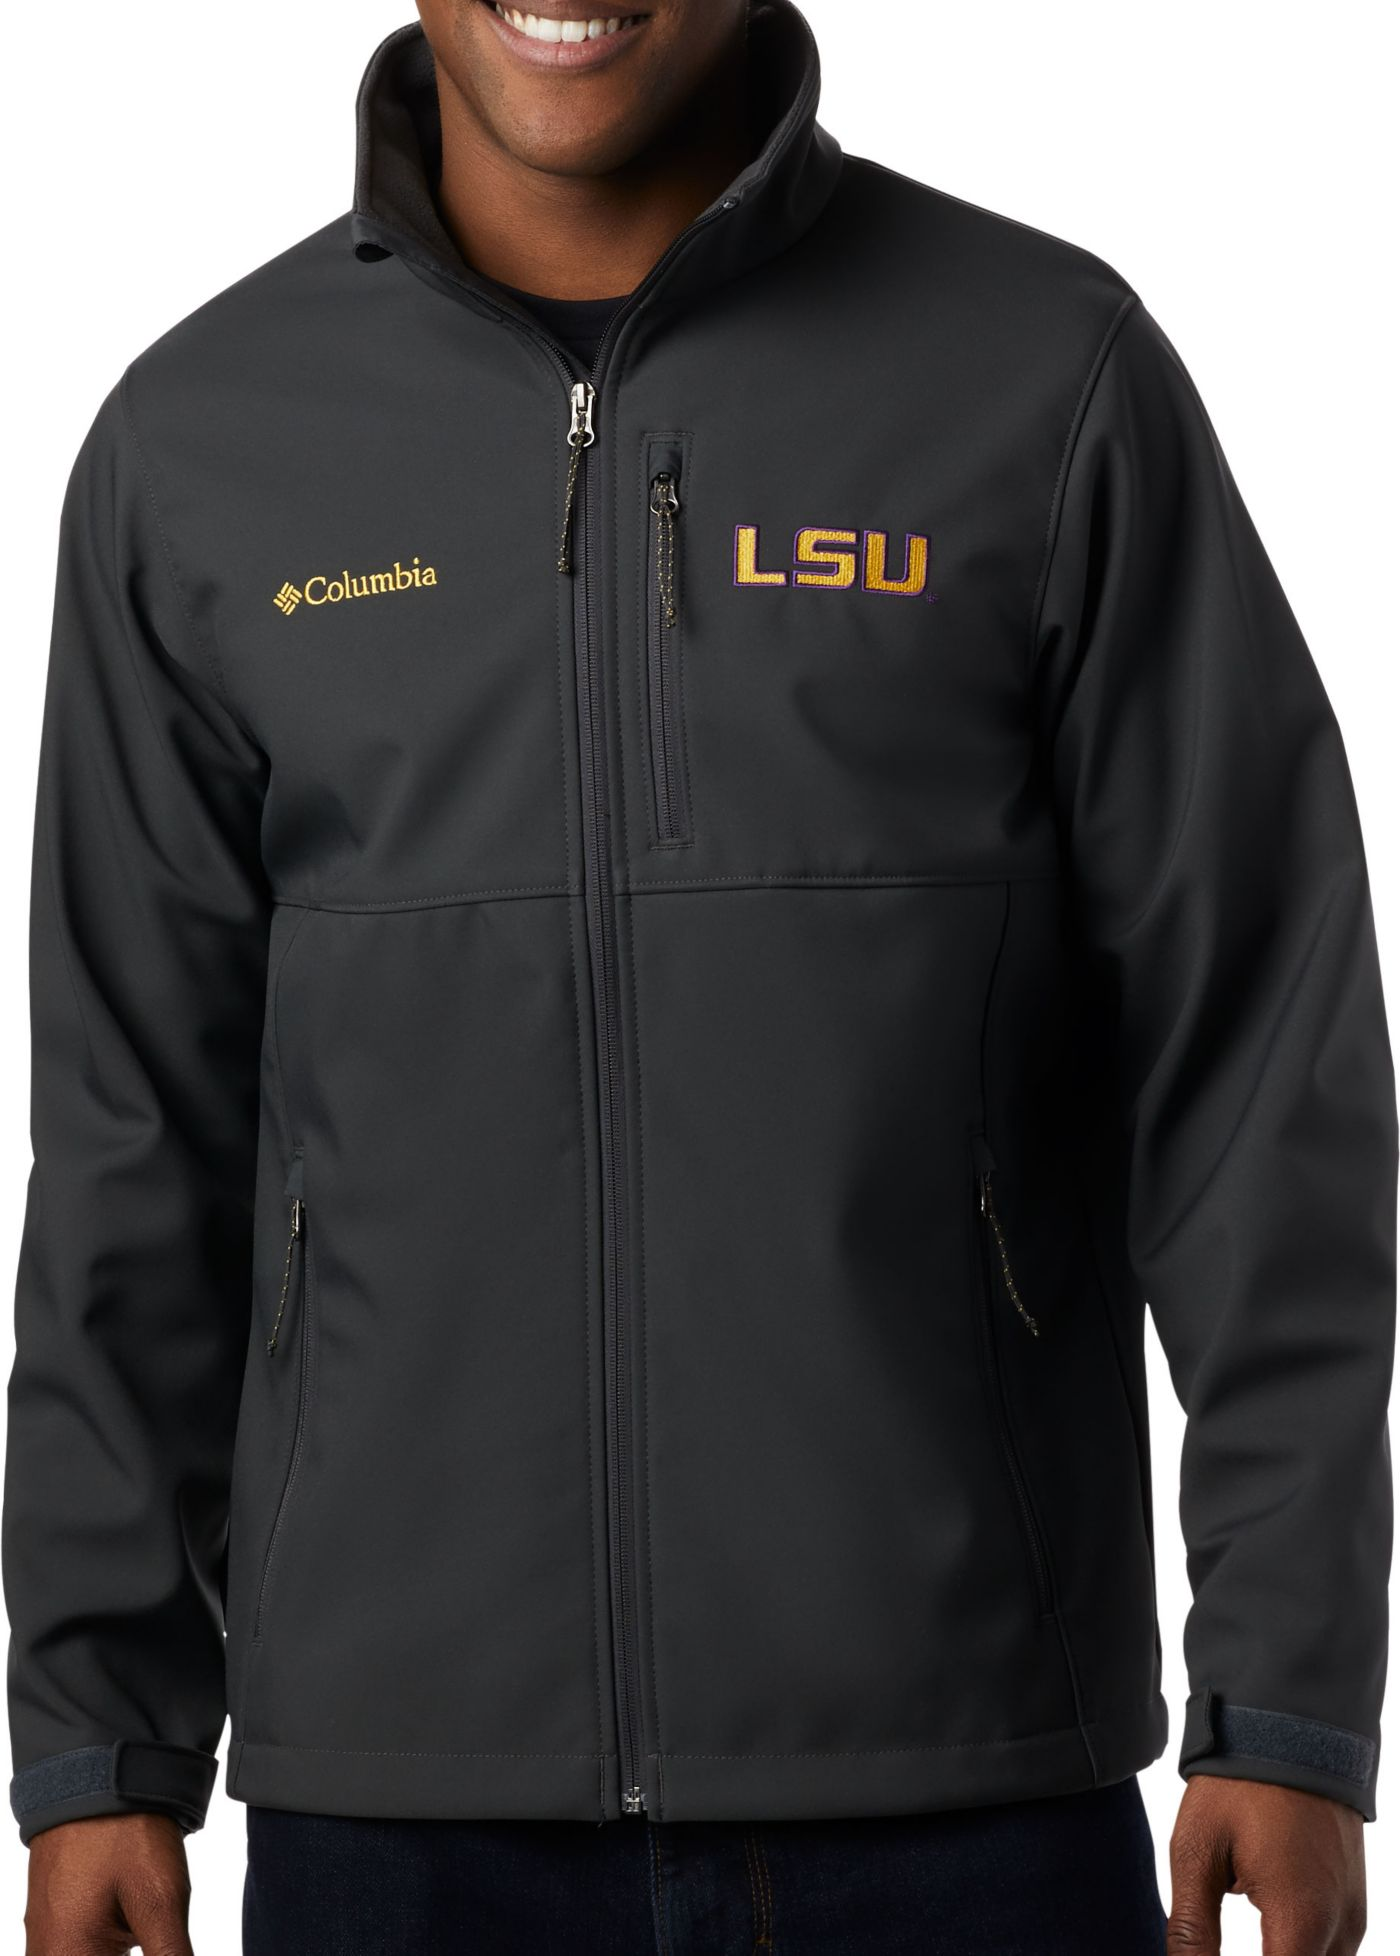 Columbia Men's LSU Tigers Grey Ascender Jacket